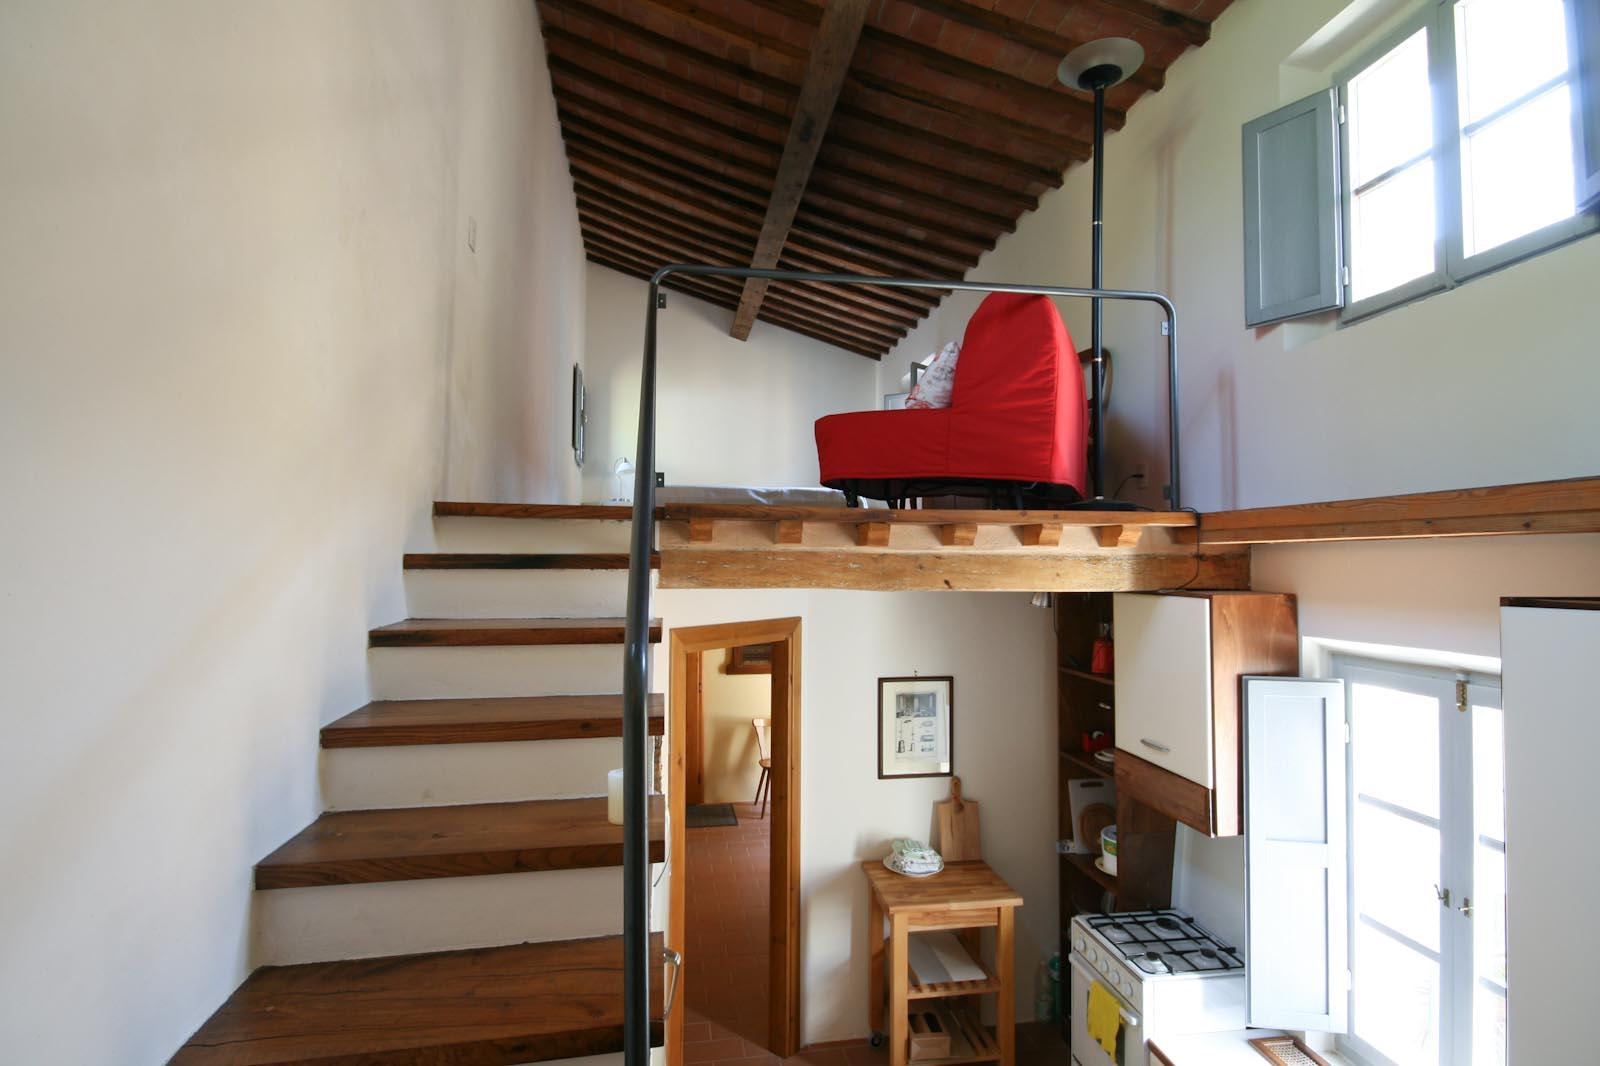 Apartment Mezzanine Floor : Winery for sale in italy tuscany pisa terricciola